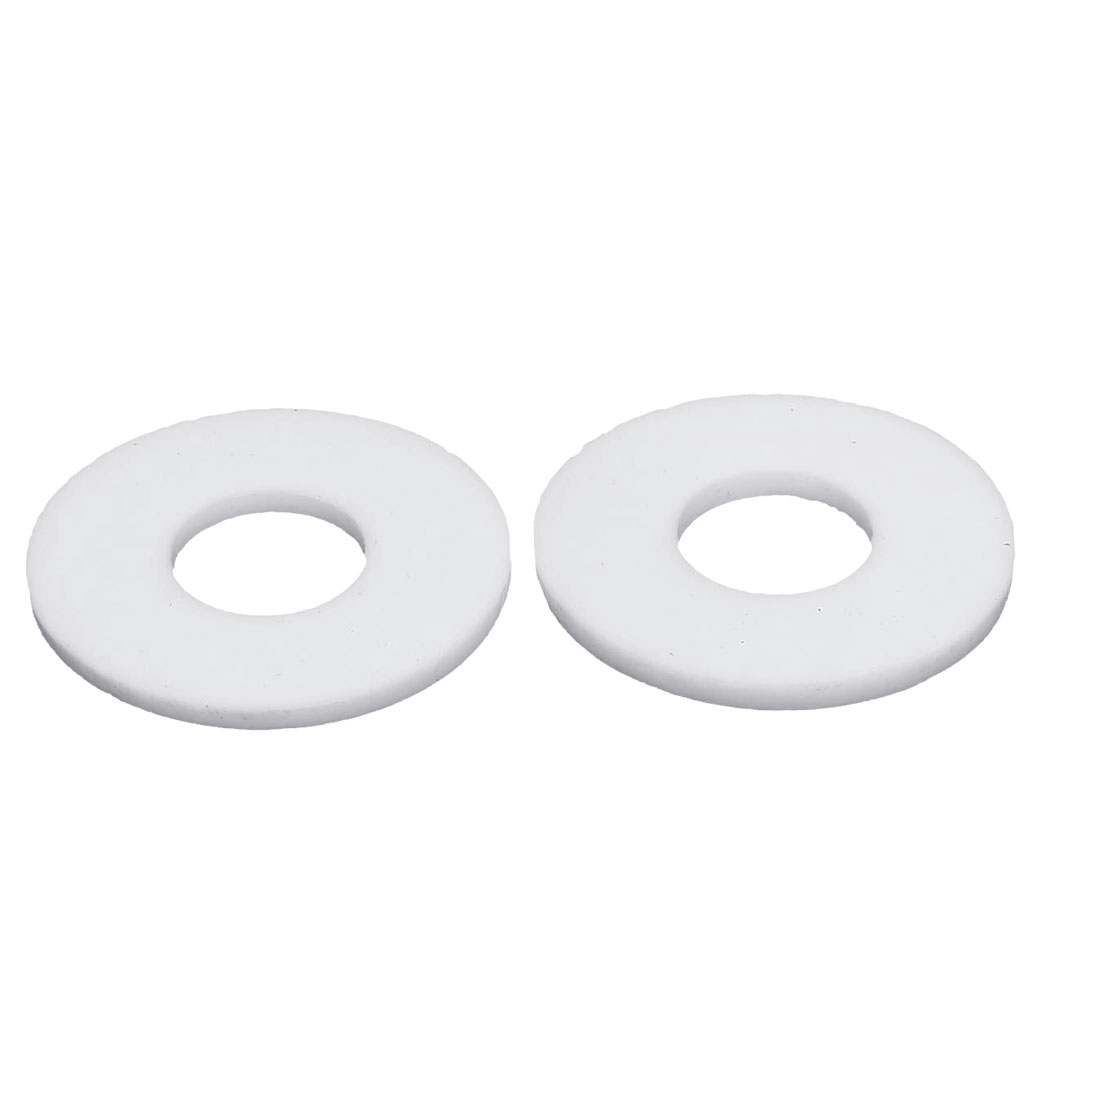 DN15 18x45x3mm PTFE Flange Gasket Sanitary Pipe Fitting Ferrules White 2pcs